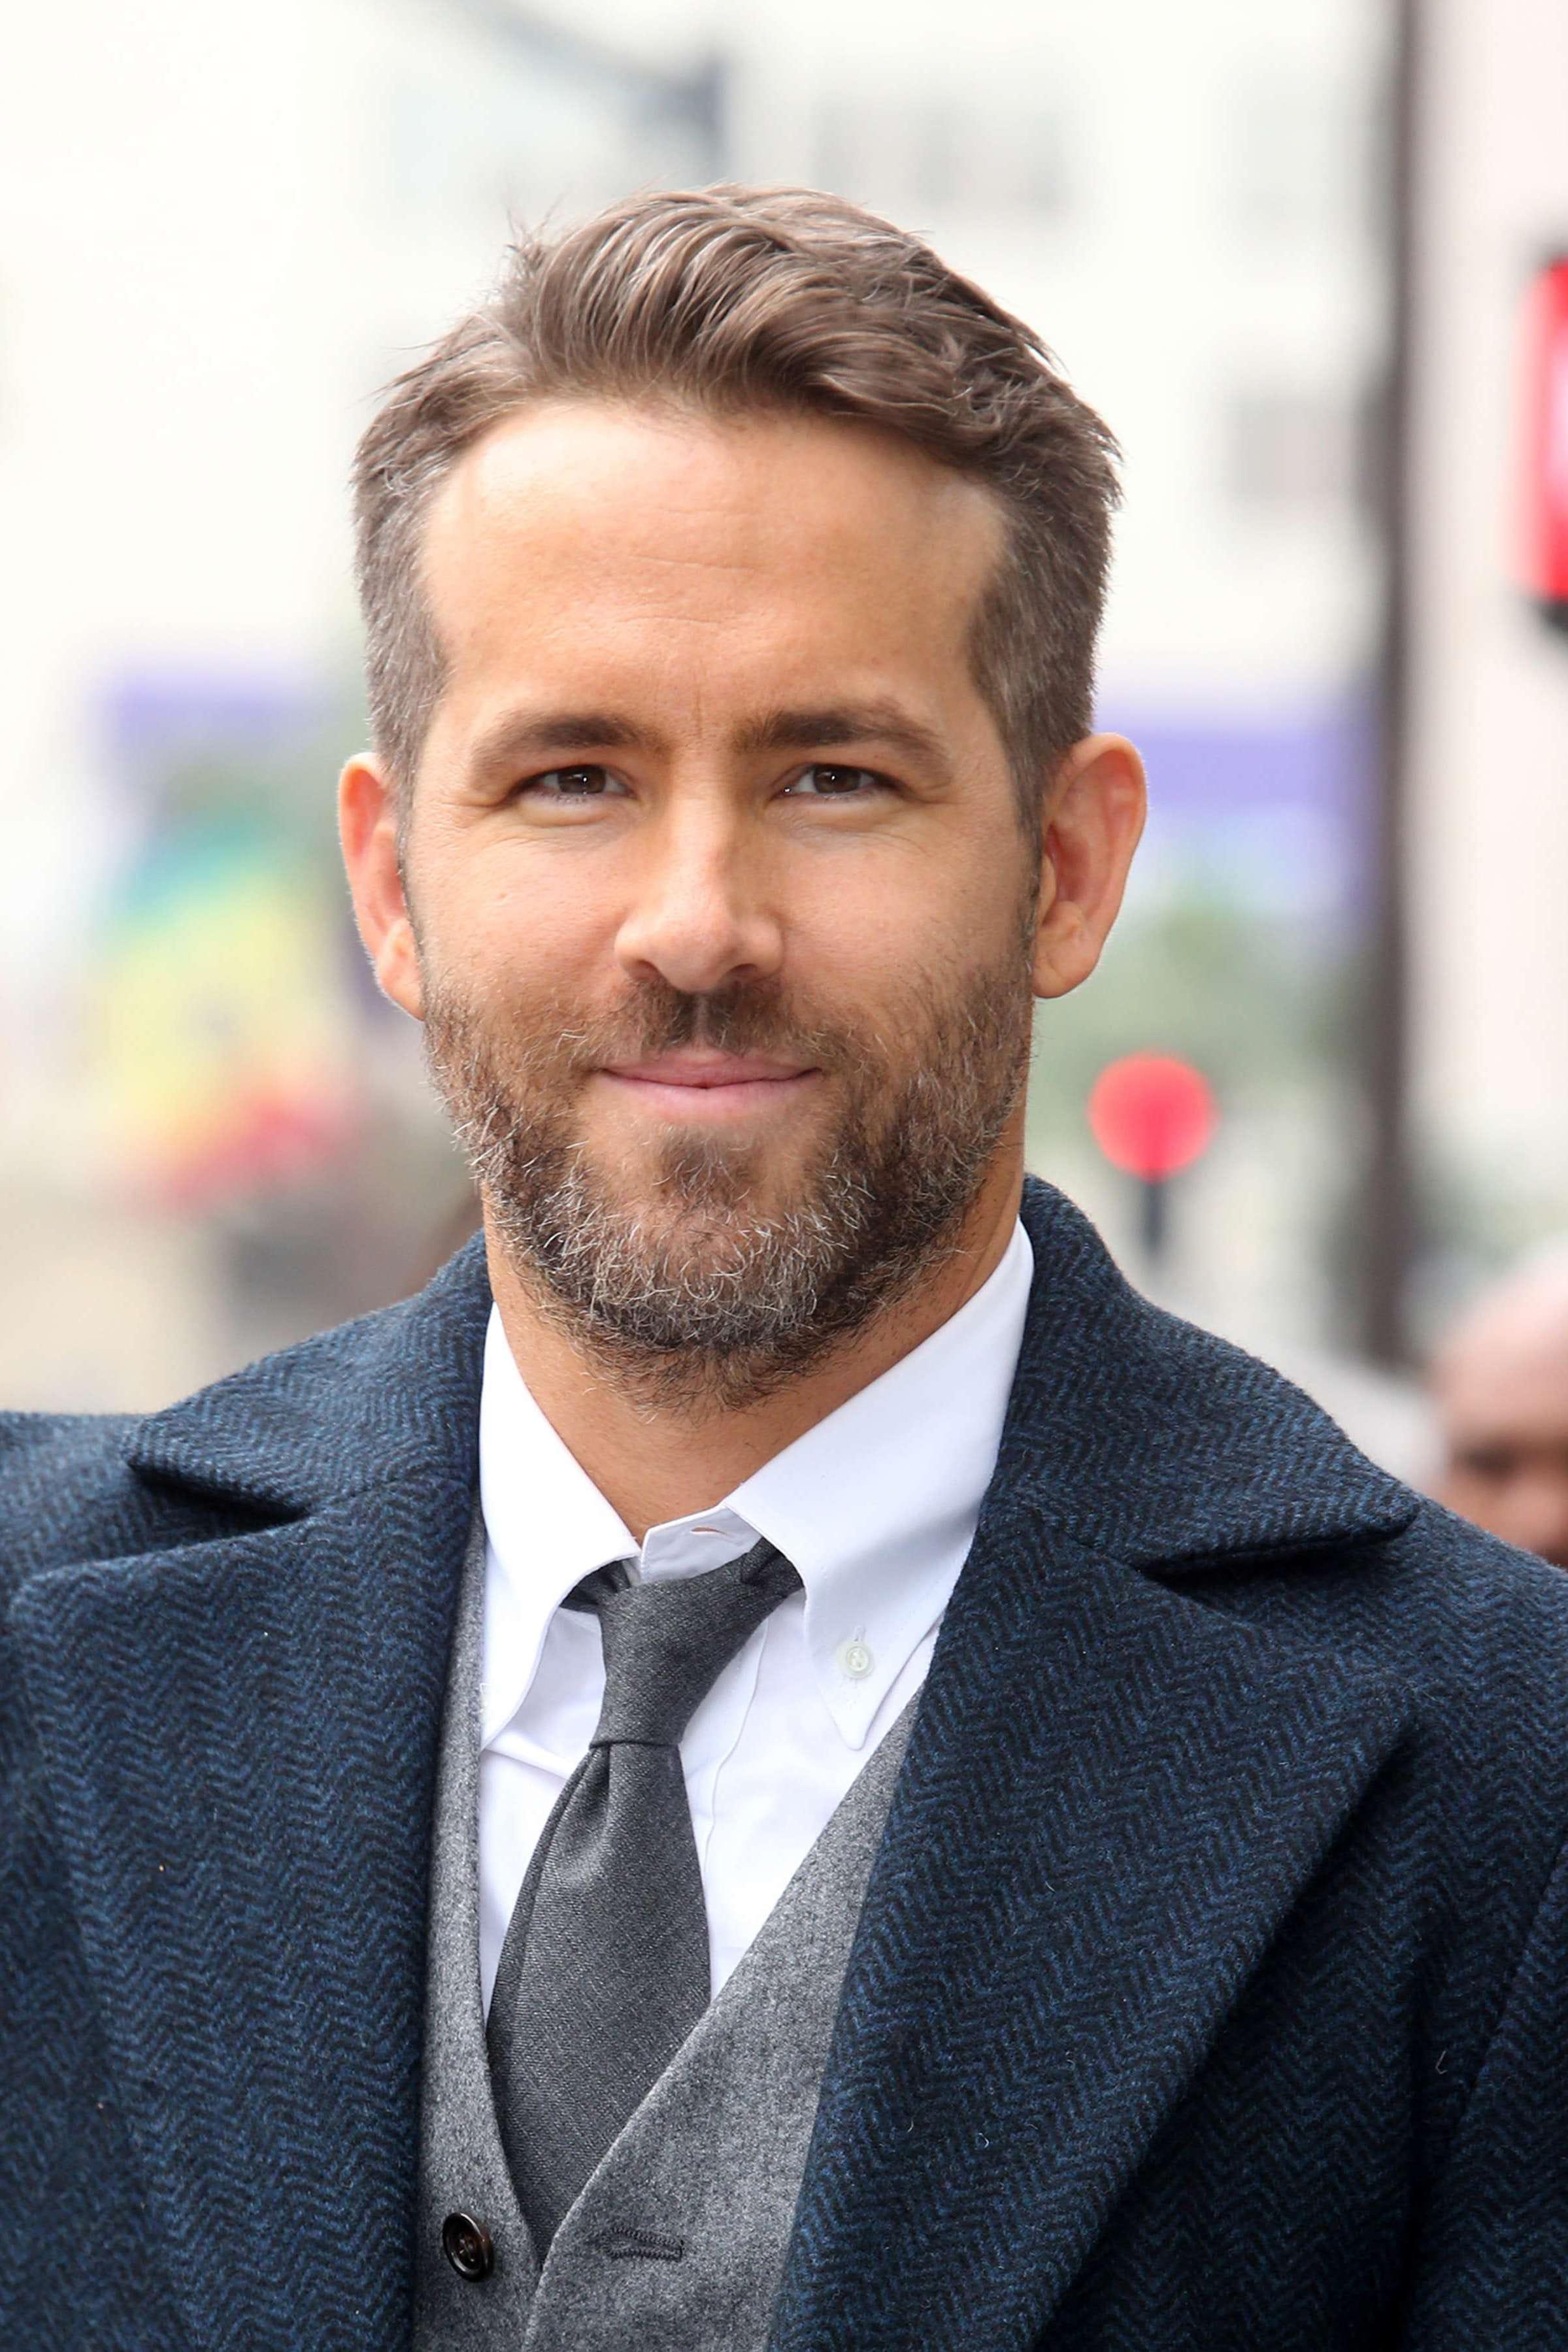 N°8 : Ryan Reynolds Ryan Reynolds